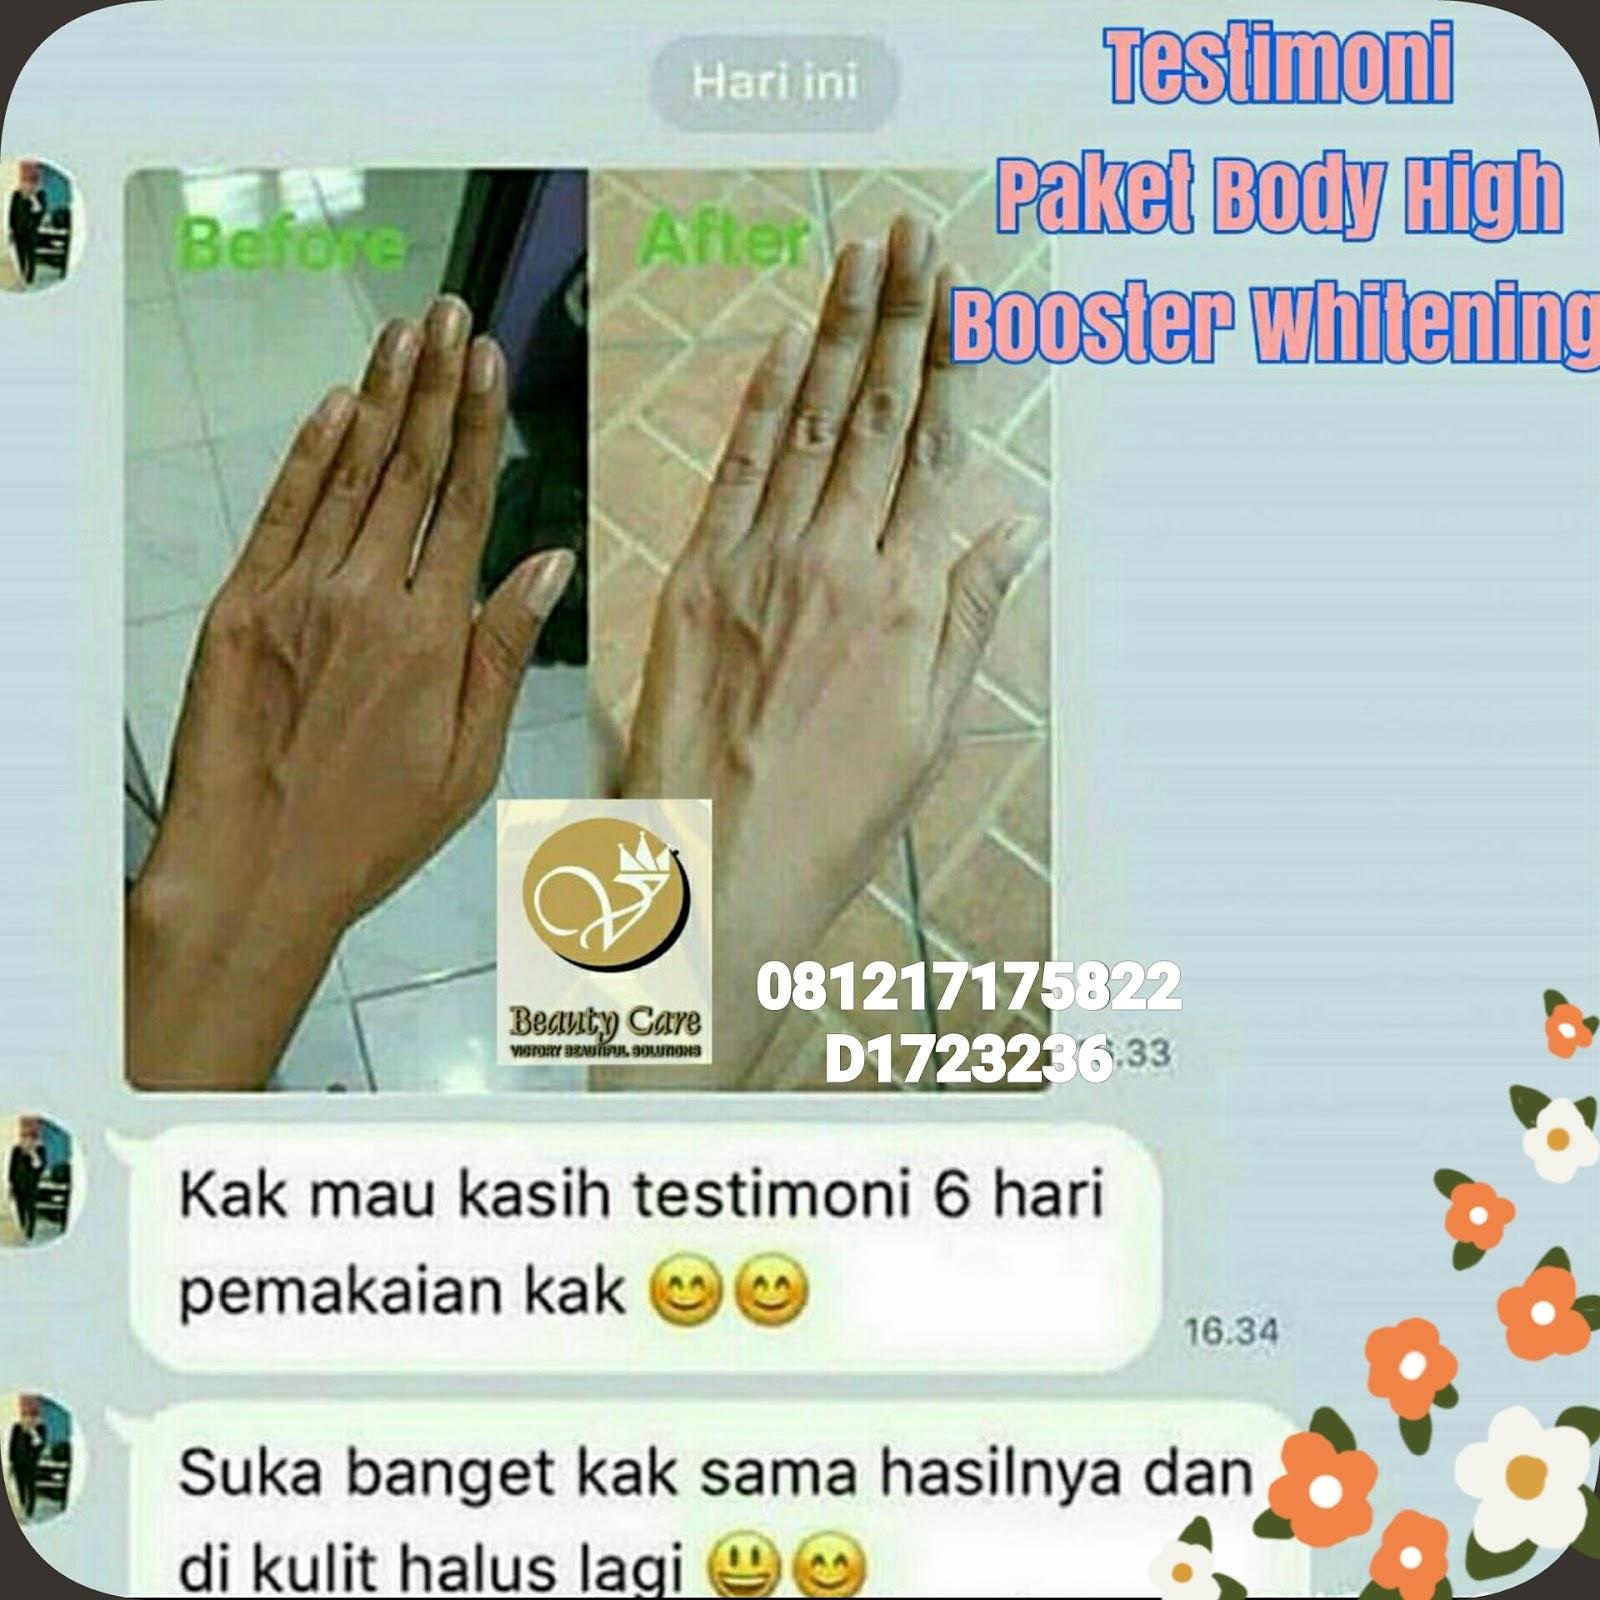 Distributor Utama Victorybeautycare V Beauty Care Ori Bpom Cream Pemutih Badan Body Gold Paket Aman Halal Skincare Perawatan Kulit Kinclong Mulus